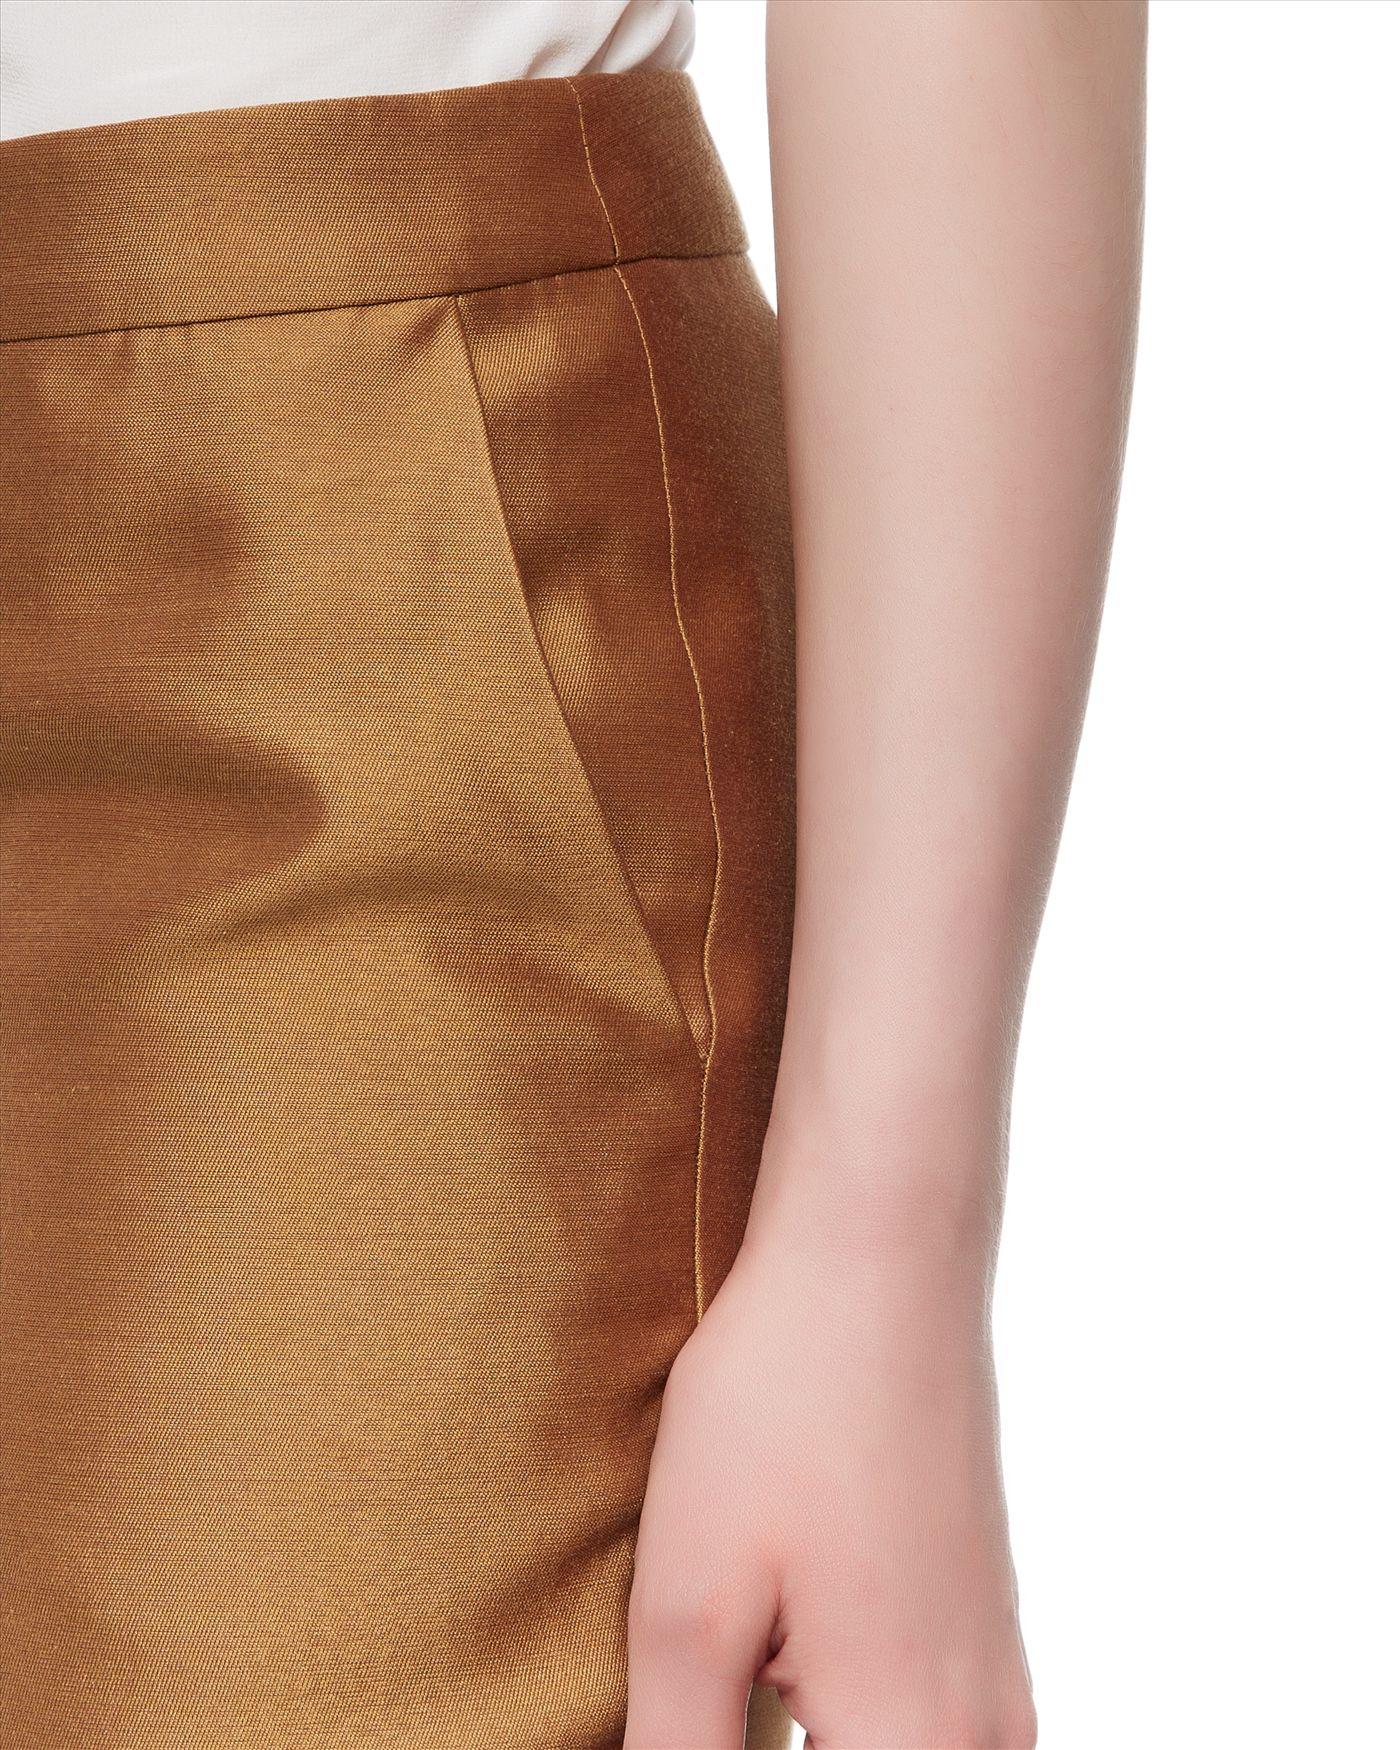 Jaeger Silk Cotton Capri Trousers in Metallic | Lyst